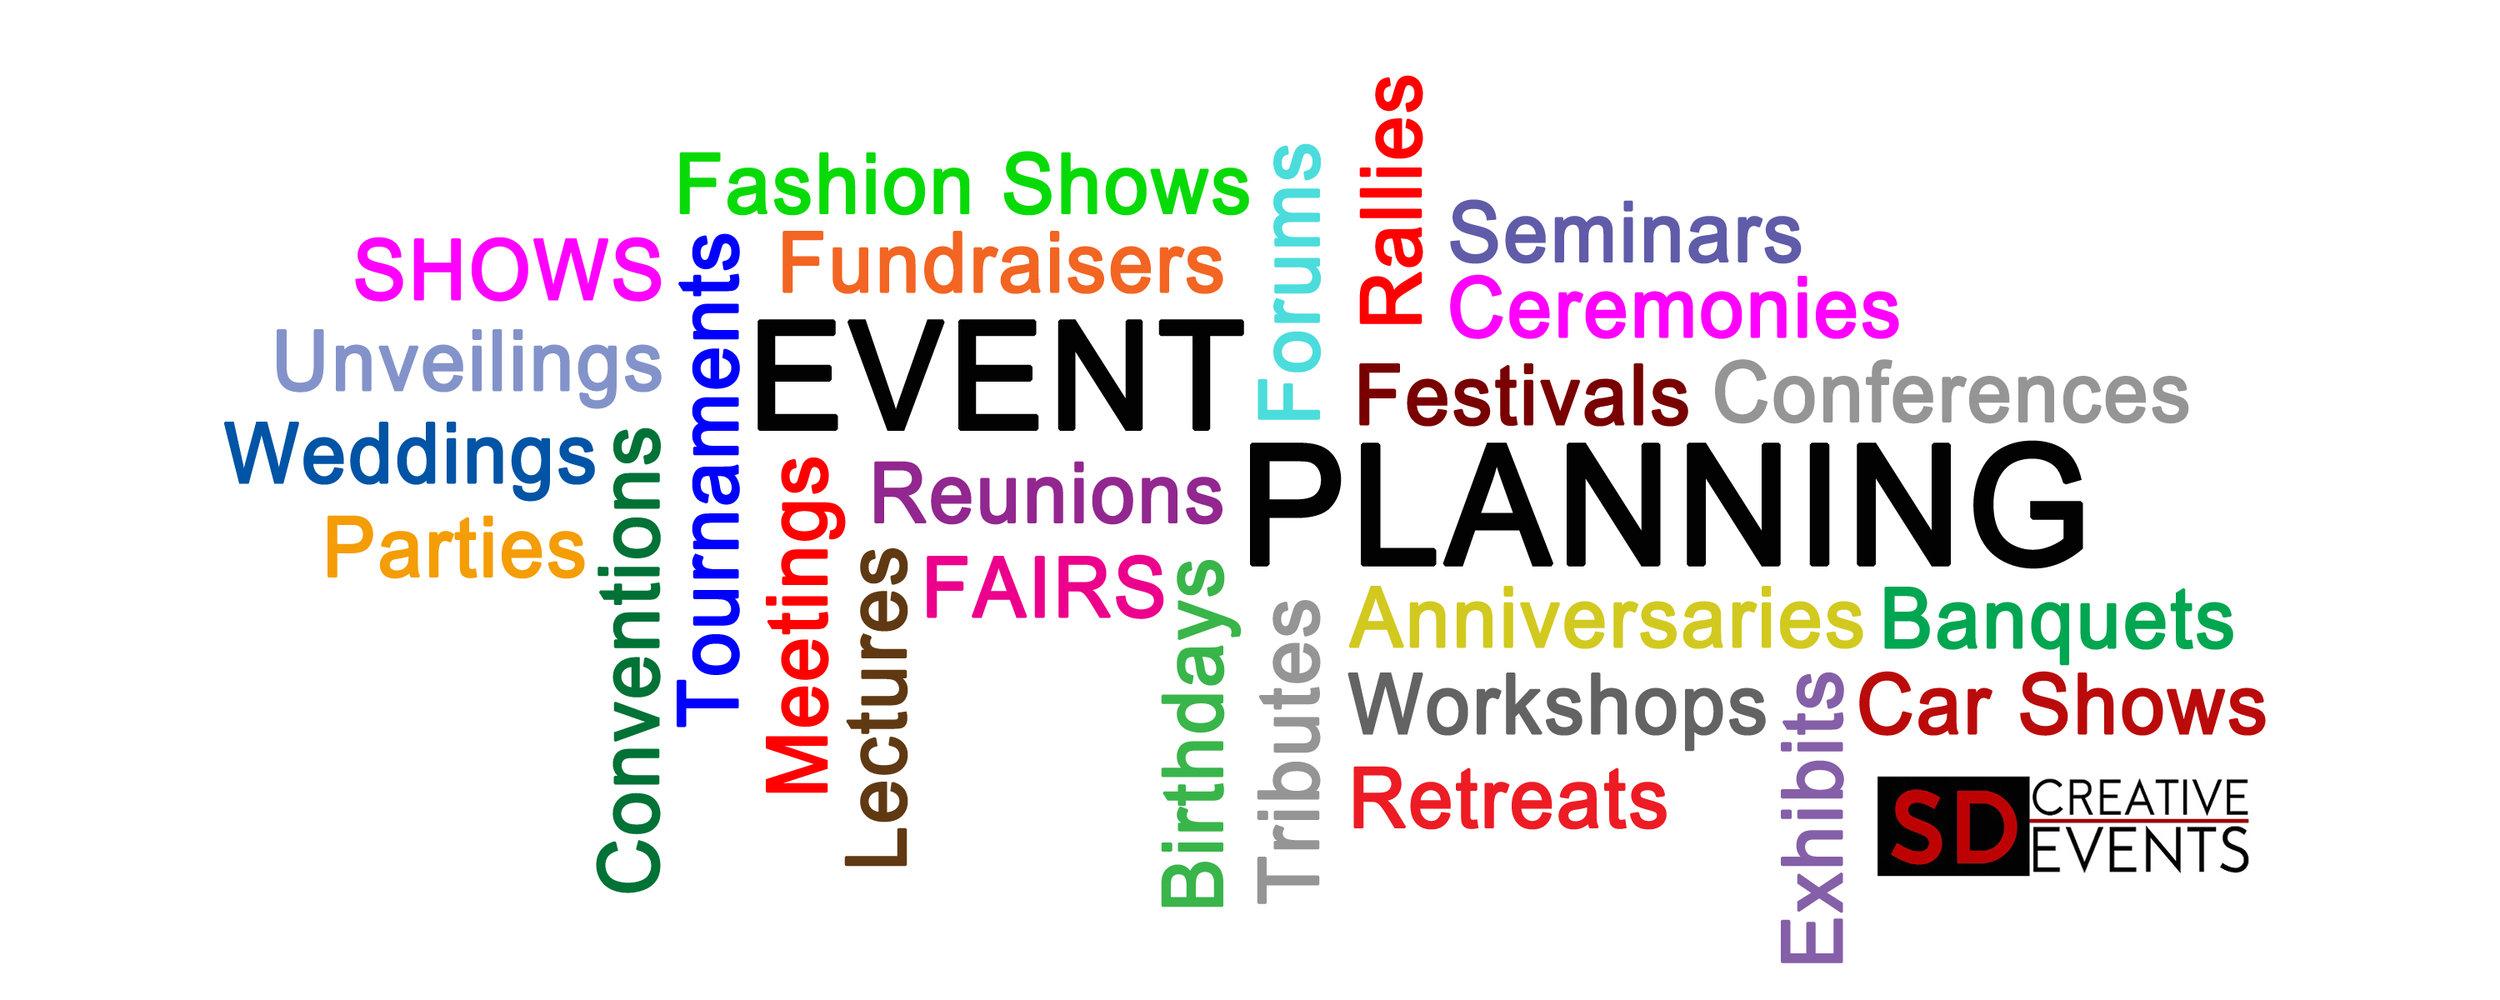 Event Planning Words Banner.jpg